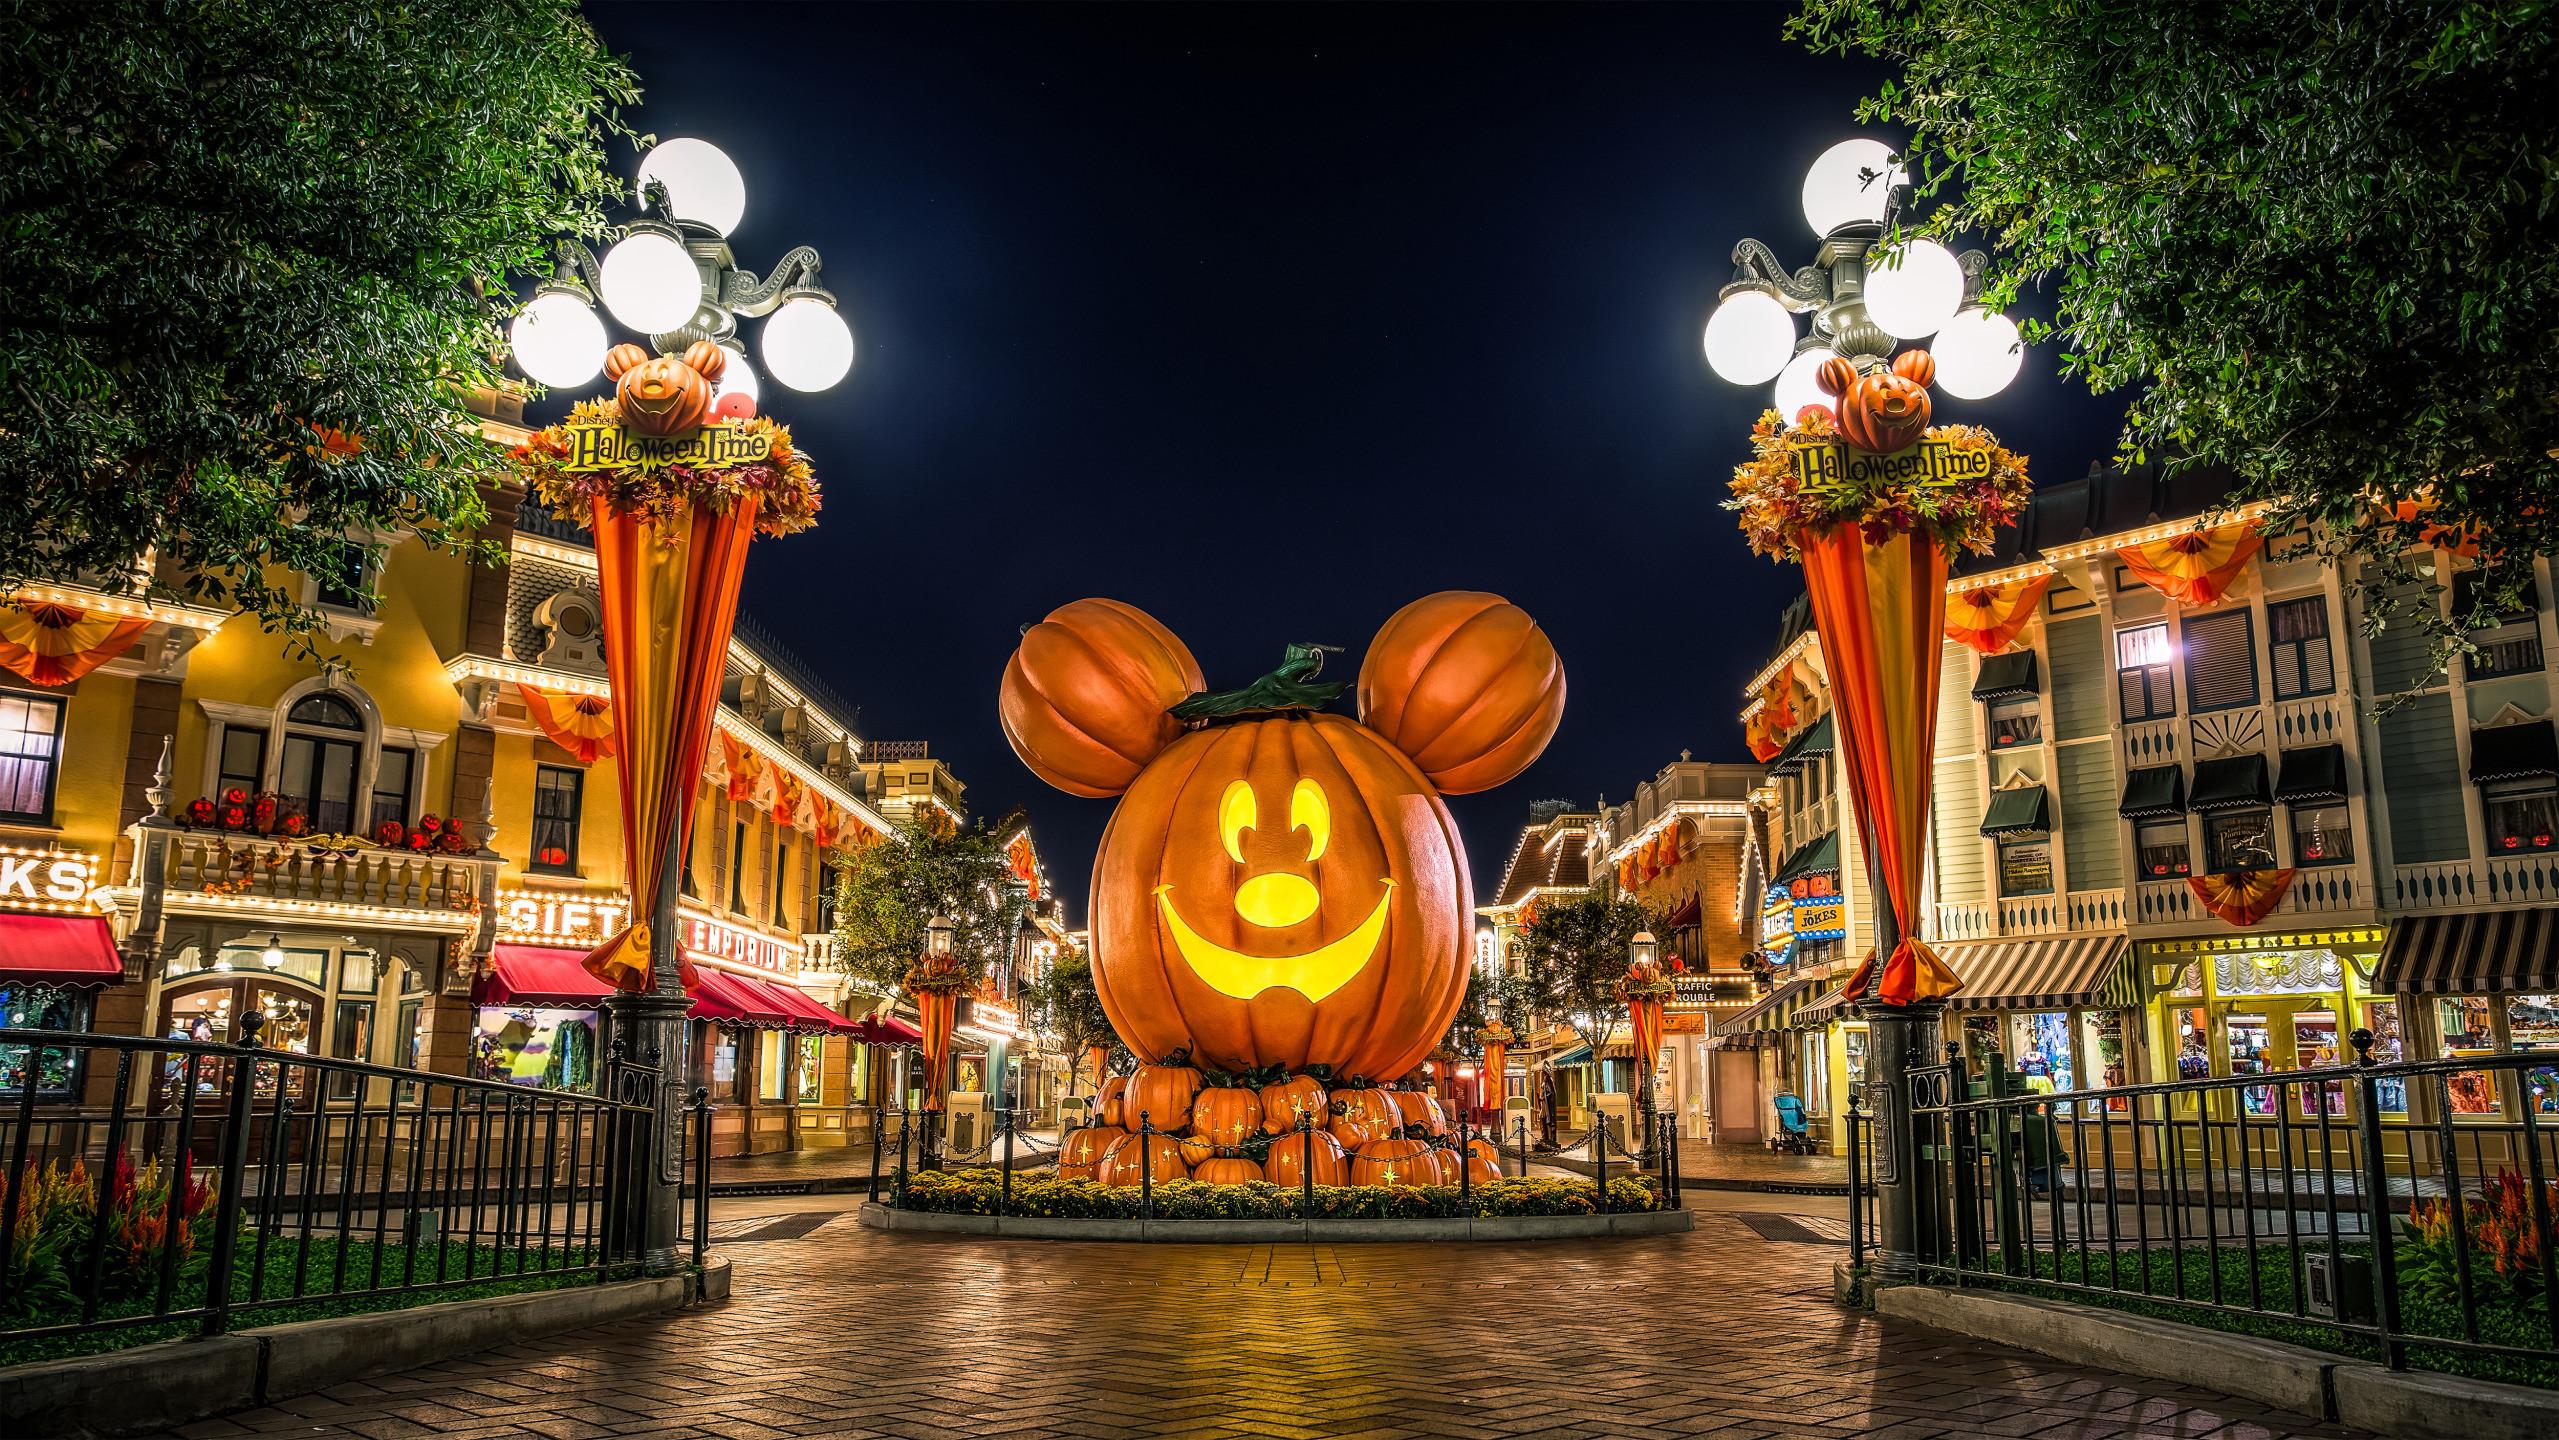 Disney Halloween Backgrounds (71+ images)